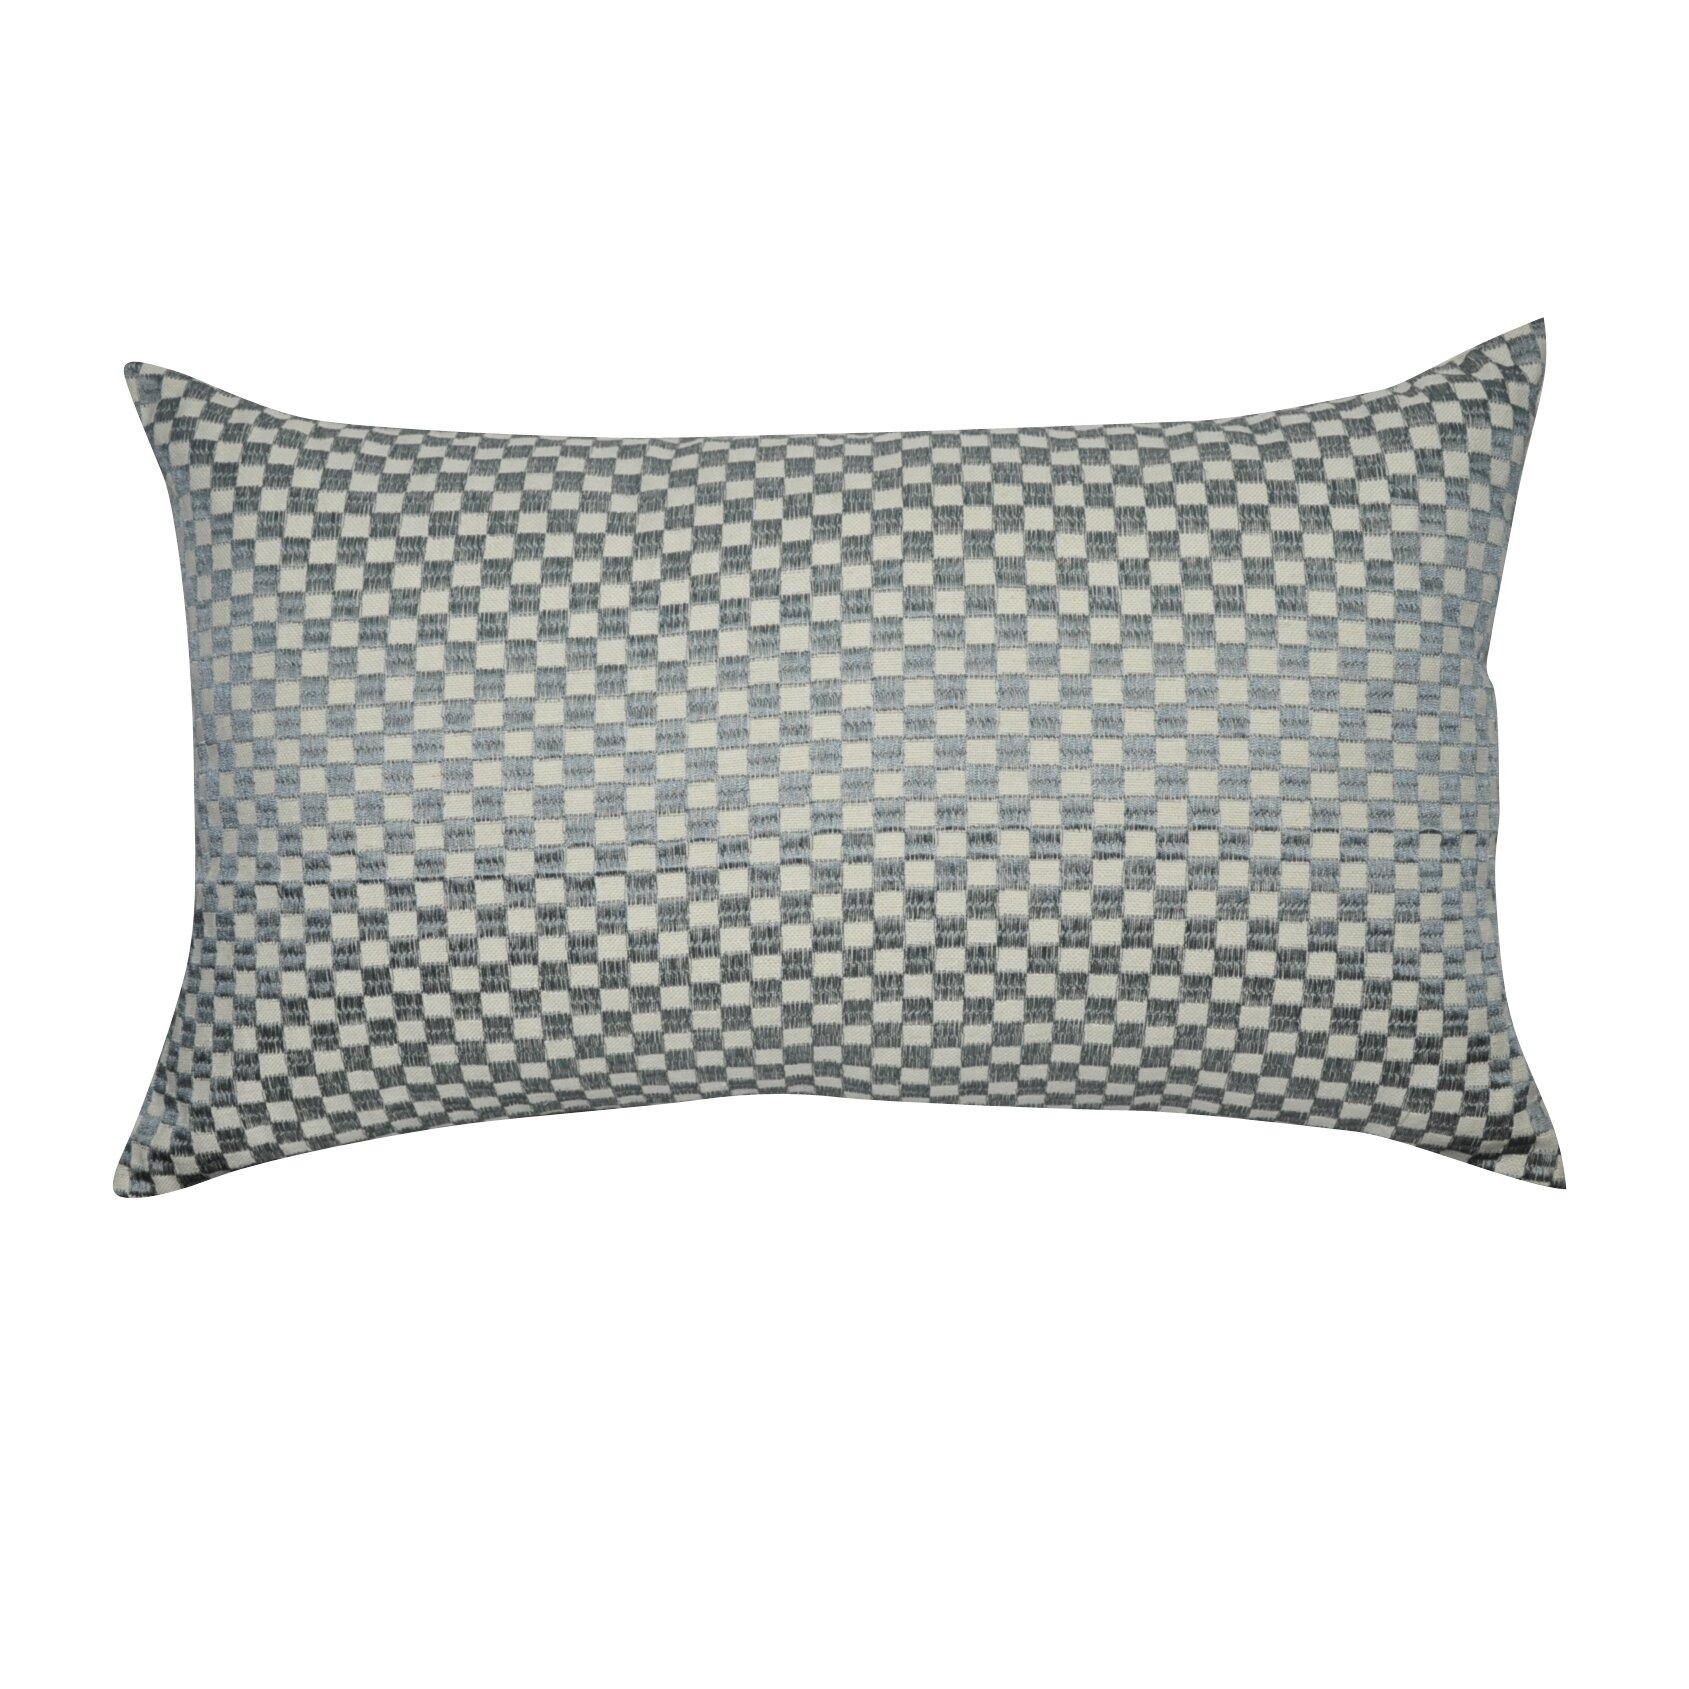 Loom and Mill Geometric Decorative Lumbar Pillow & Reviews Wayfair.ca